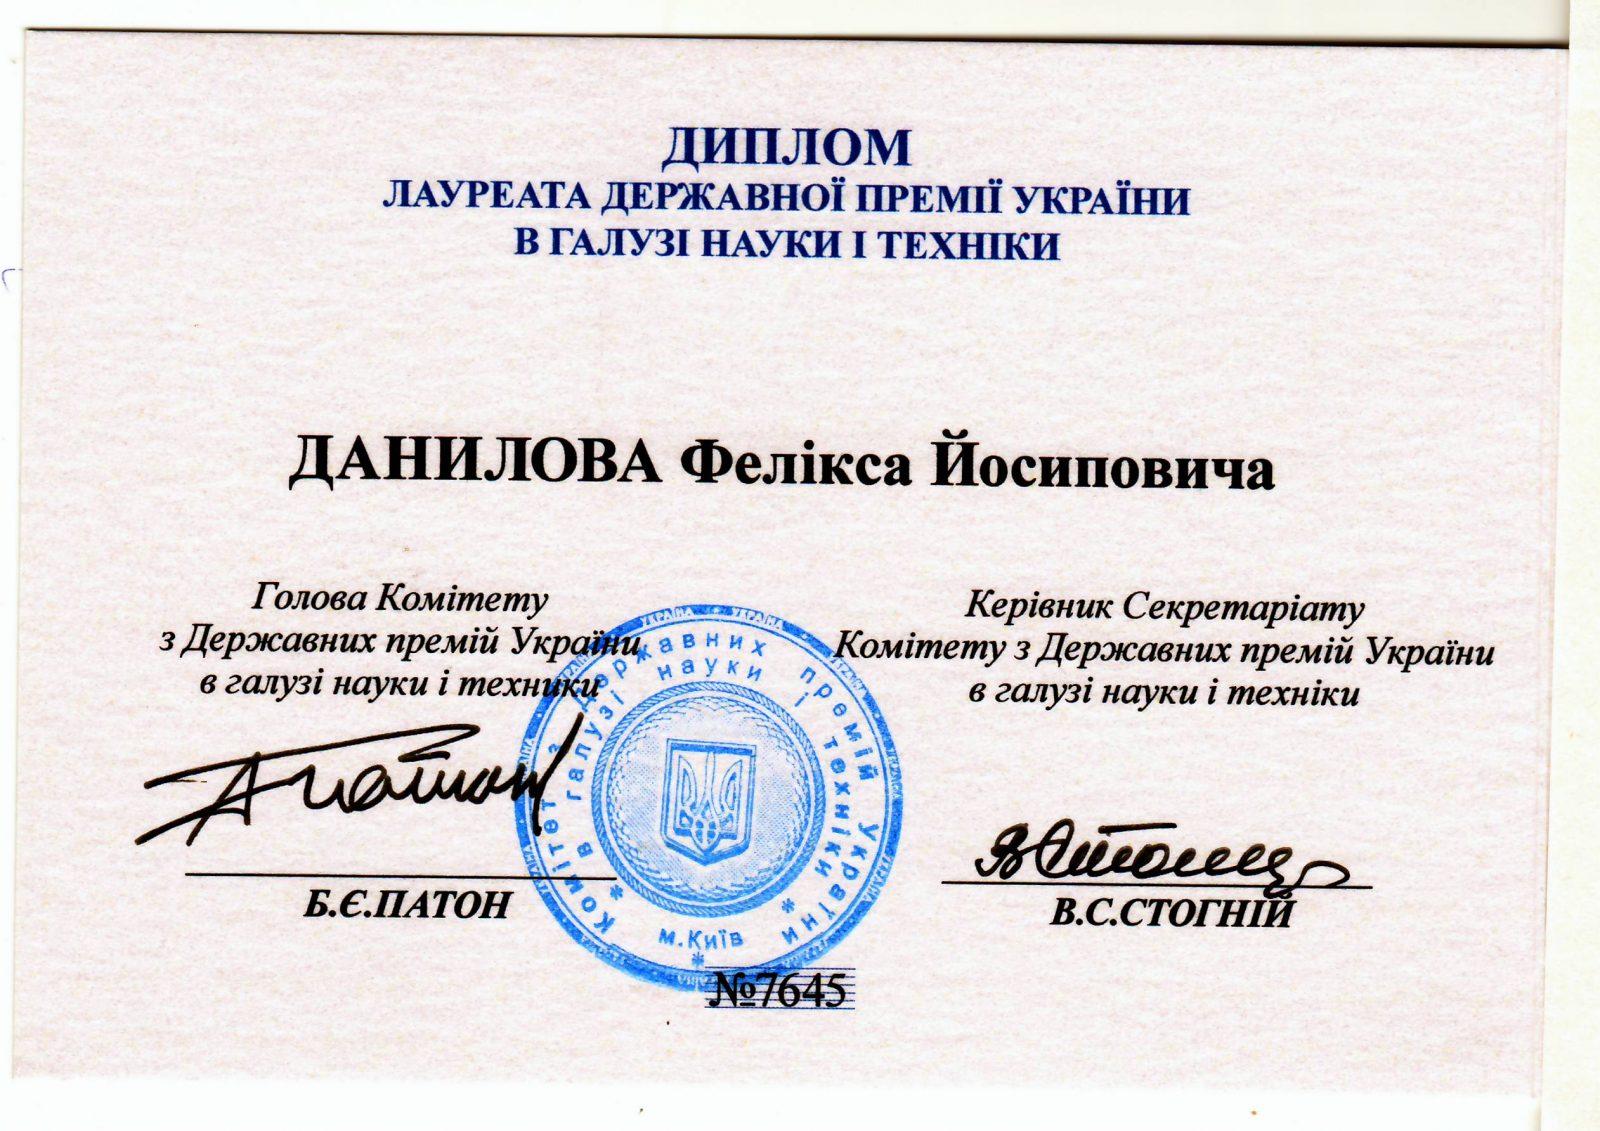 диплом Данилова Ф.Й. (Премія)